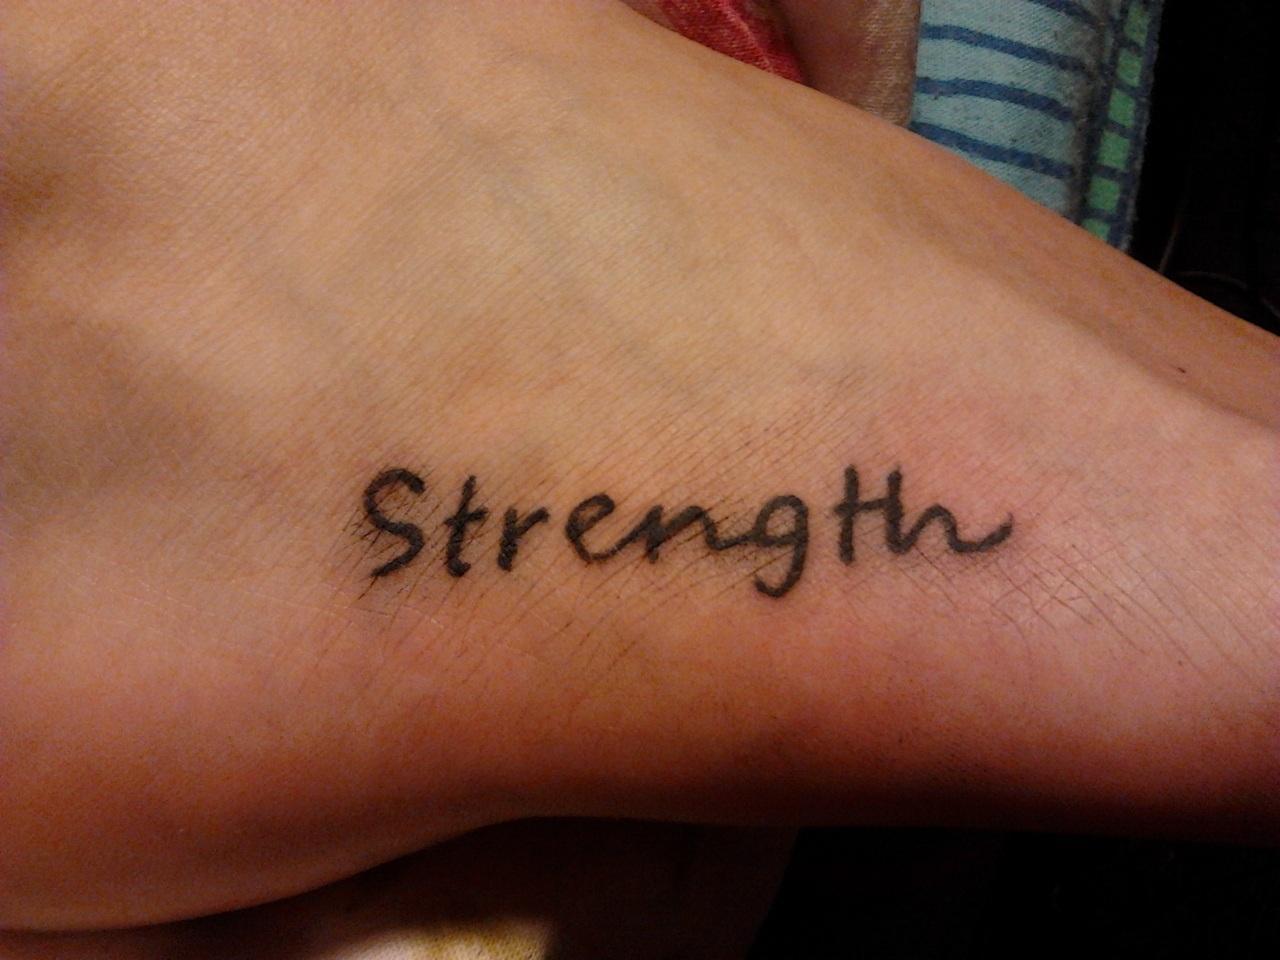 Strength tattoo images designs for Strength tattoos ideas